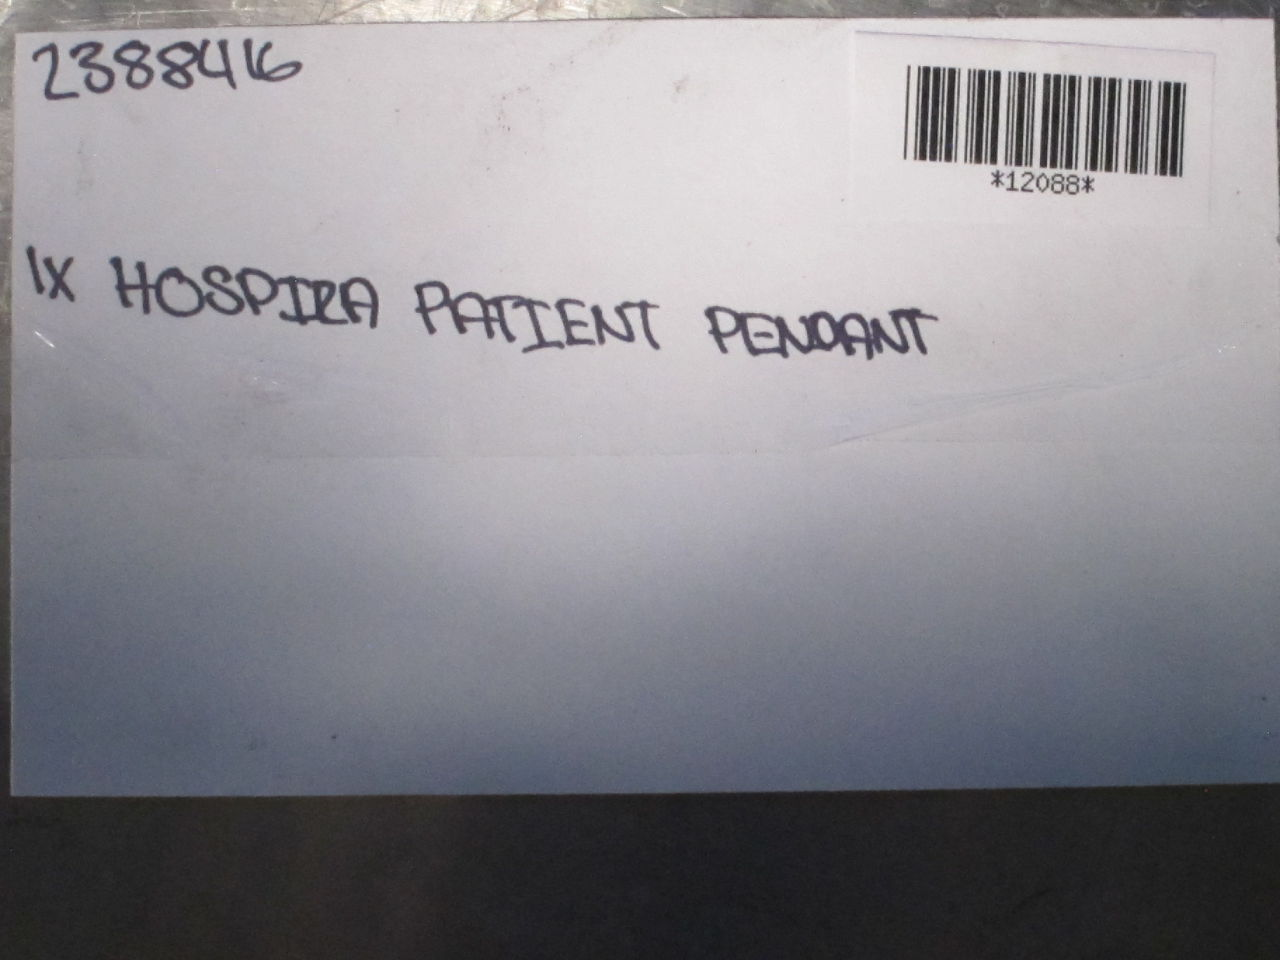 HOSPIRA  Patient Pendant